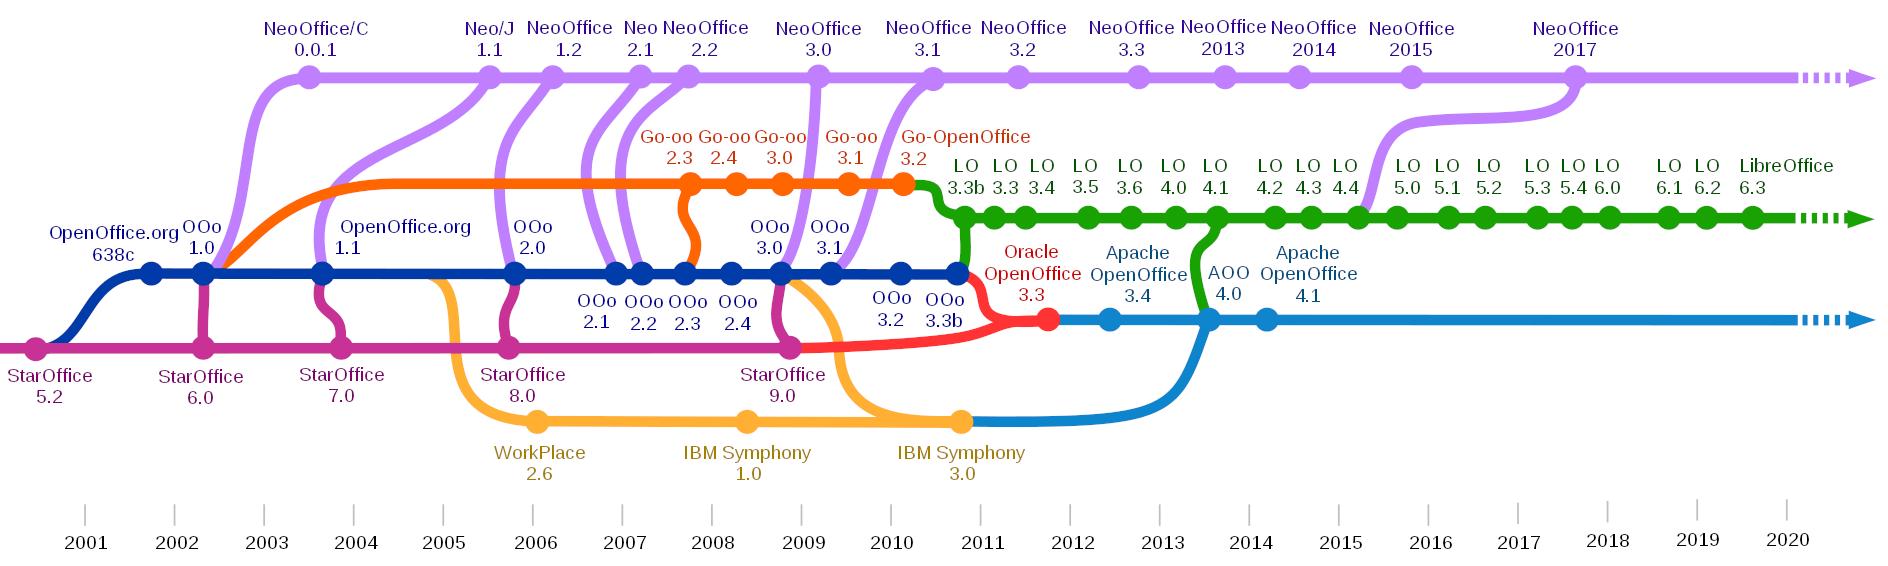 「StarOffice」、「OpenOffice.org」、「Apache OpenOffice」、「LibreOffice」の関係